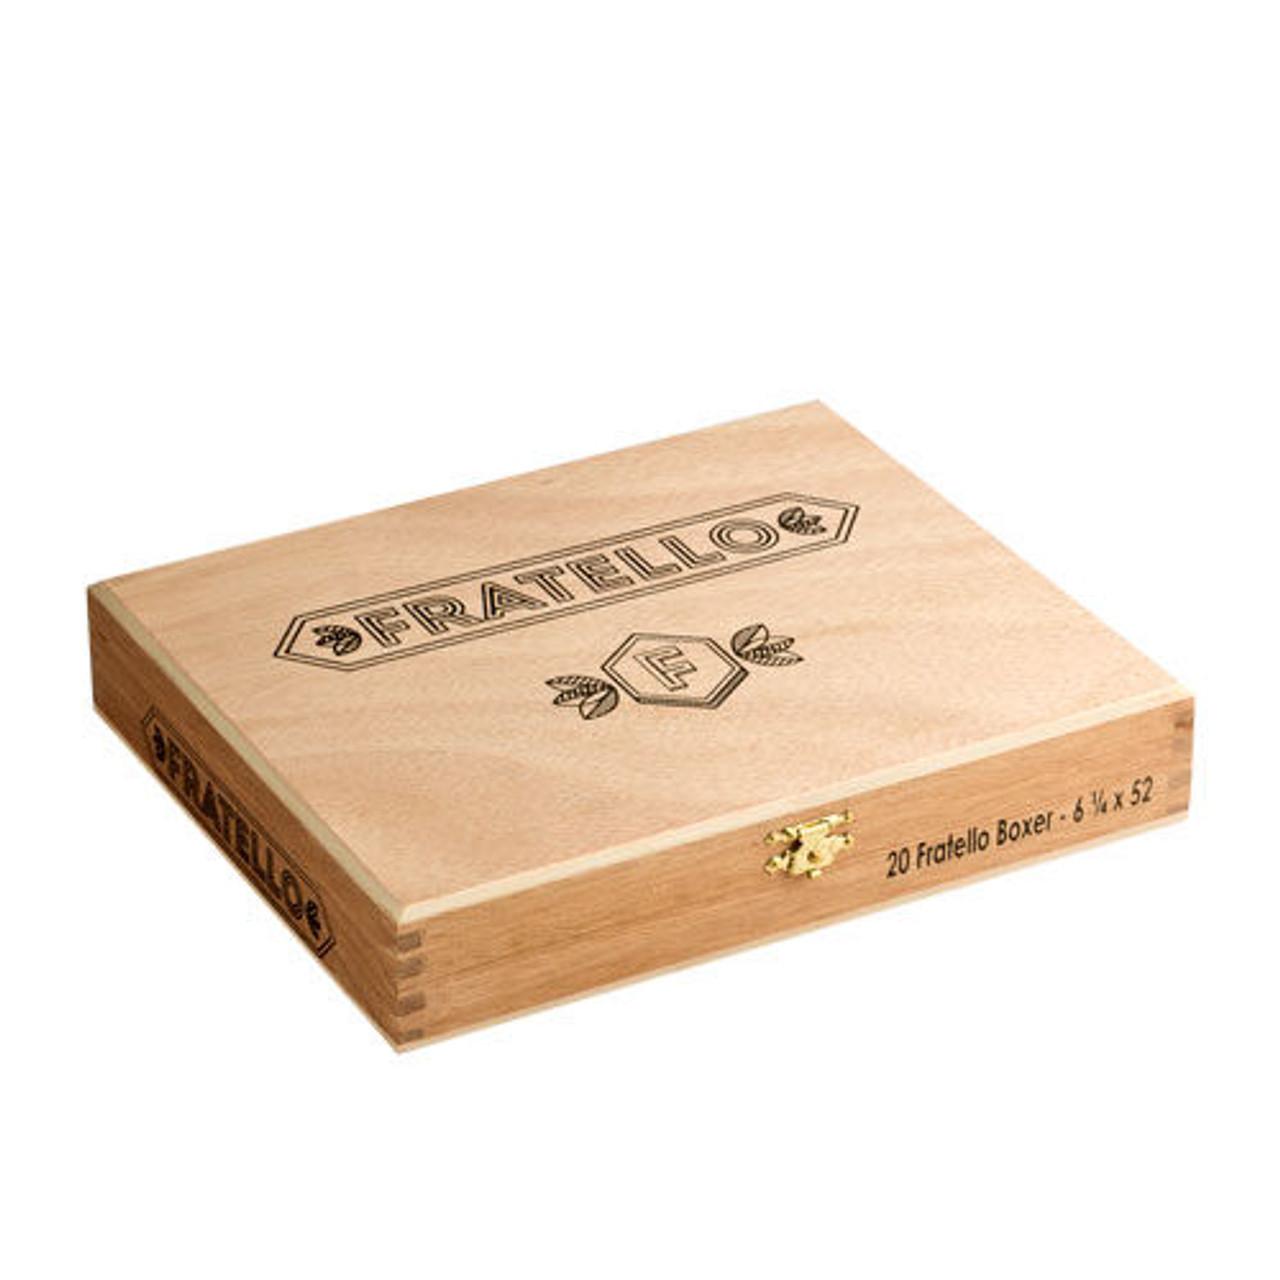 Fratello Boxer Cigars - 6.25 x 52 (Box of 20)